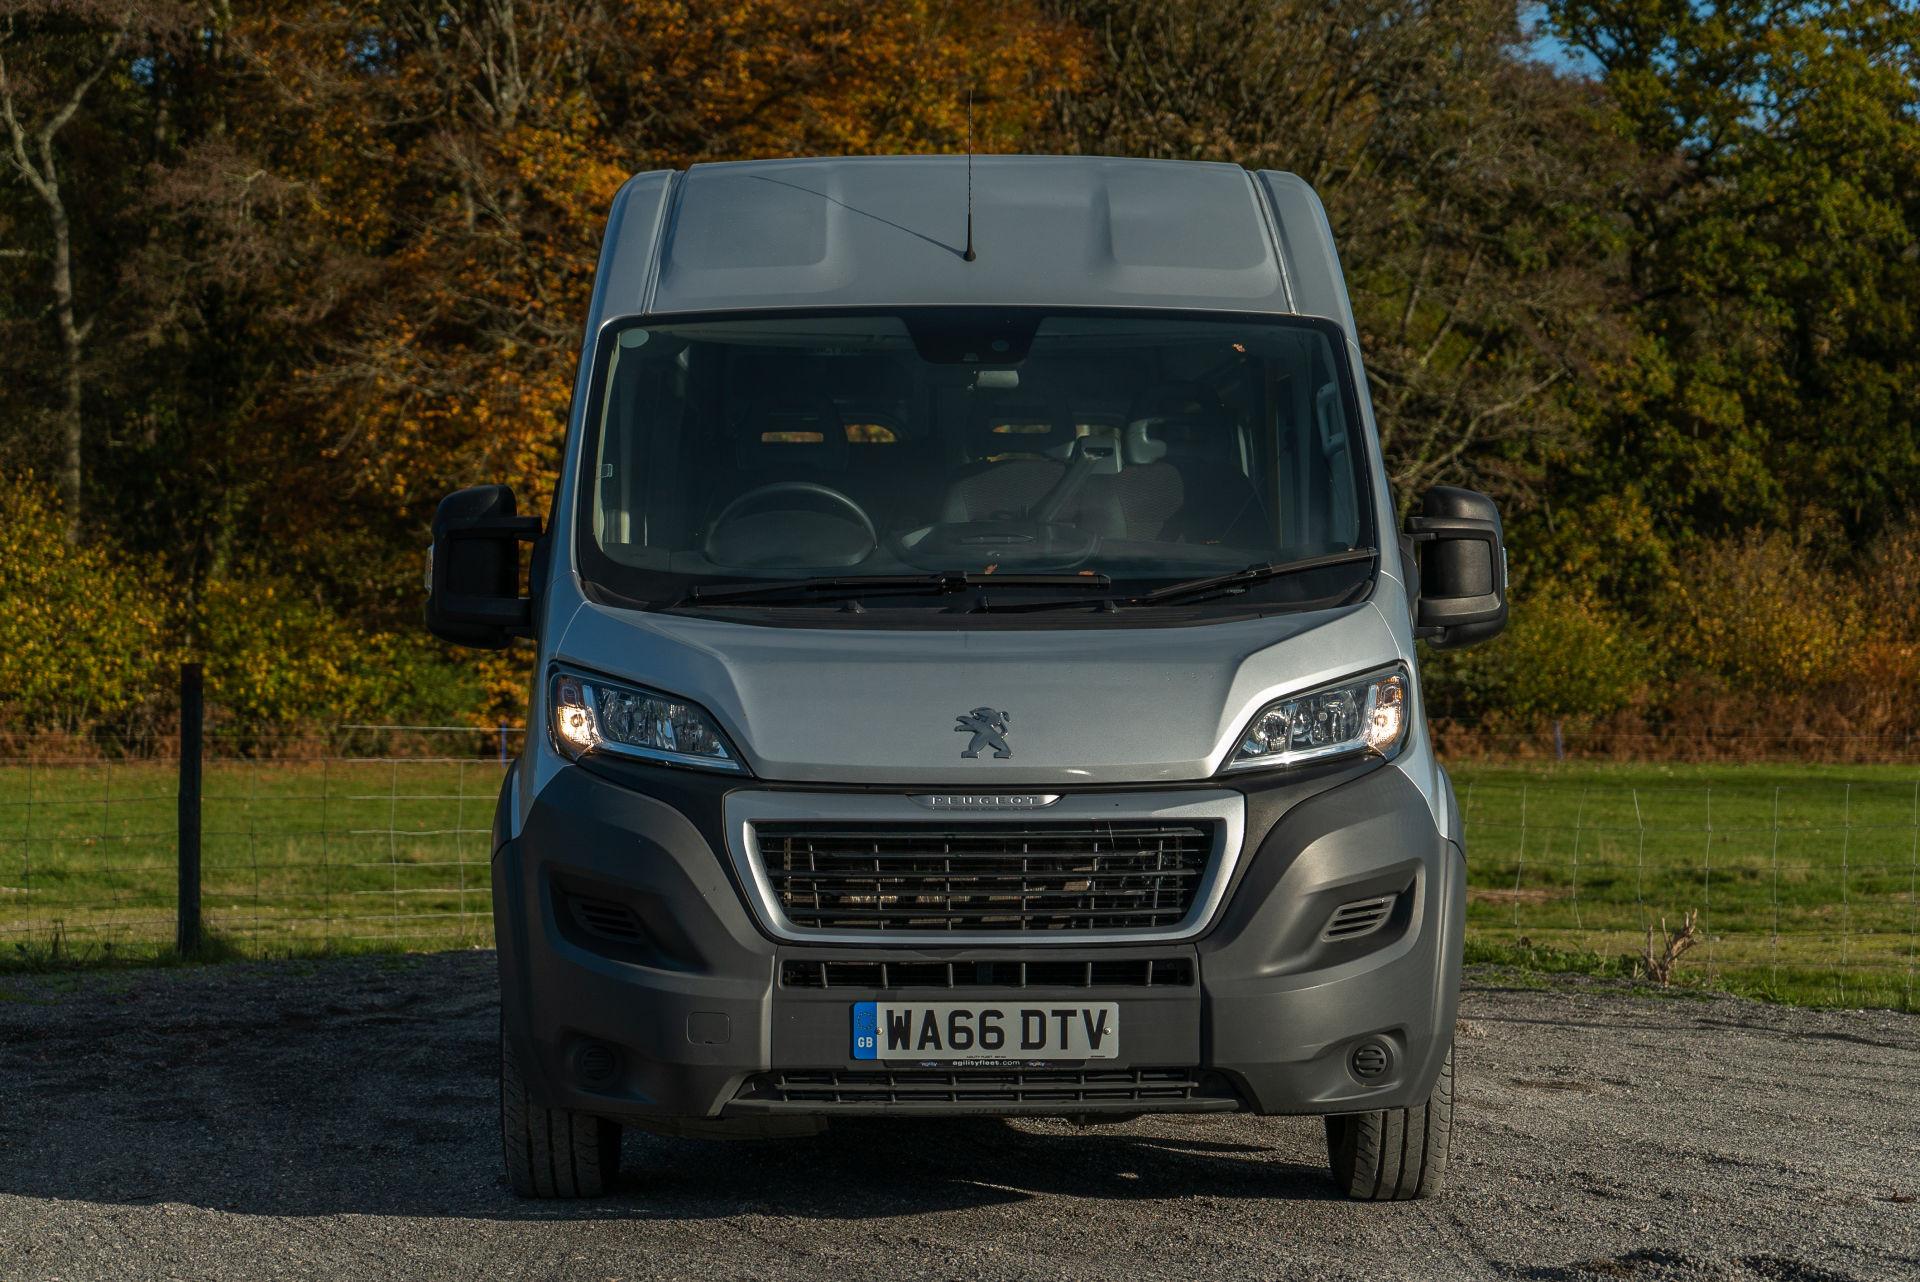 2016 Peugeot Boxer 17 Seater Accessible Minibus for Sale - Image 1